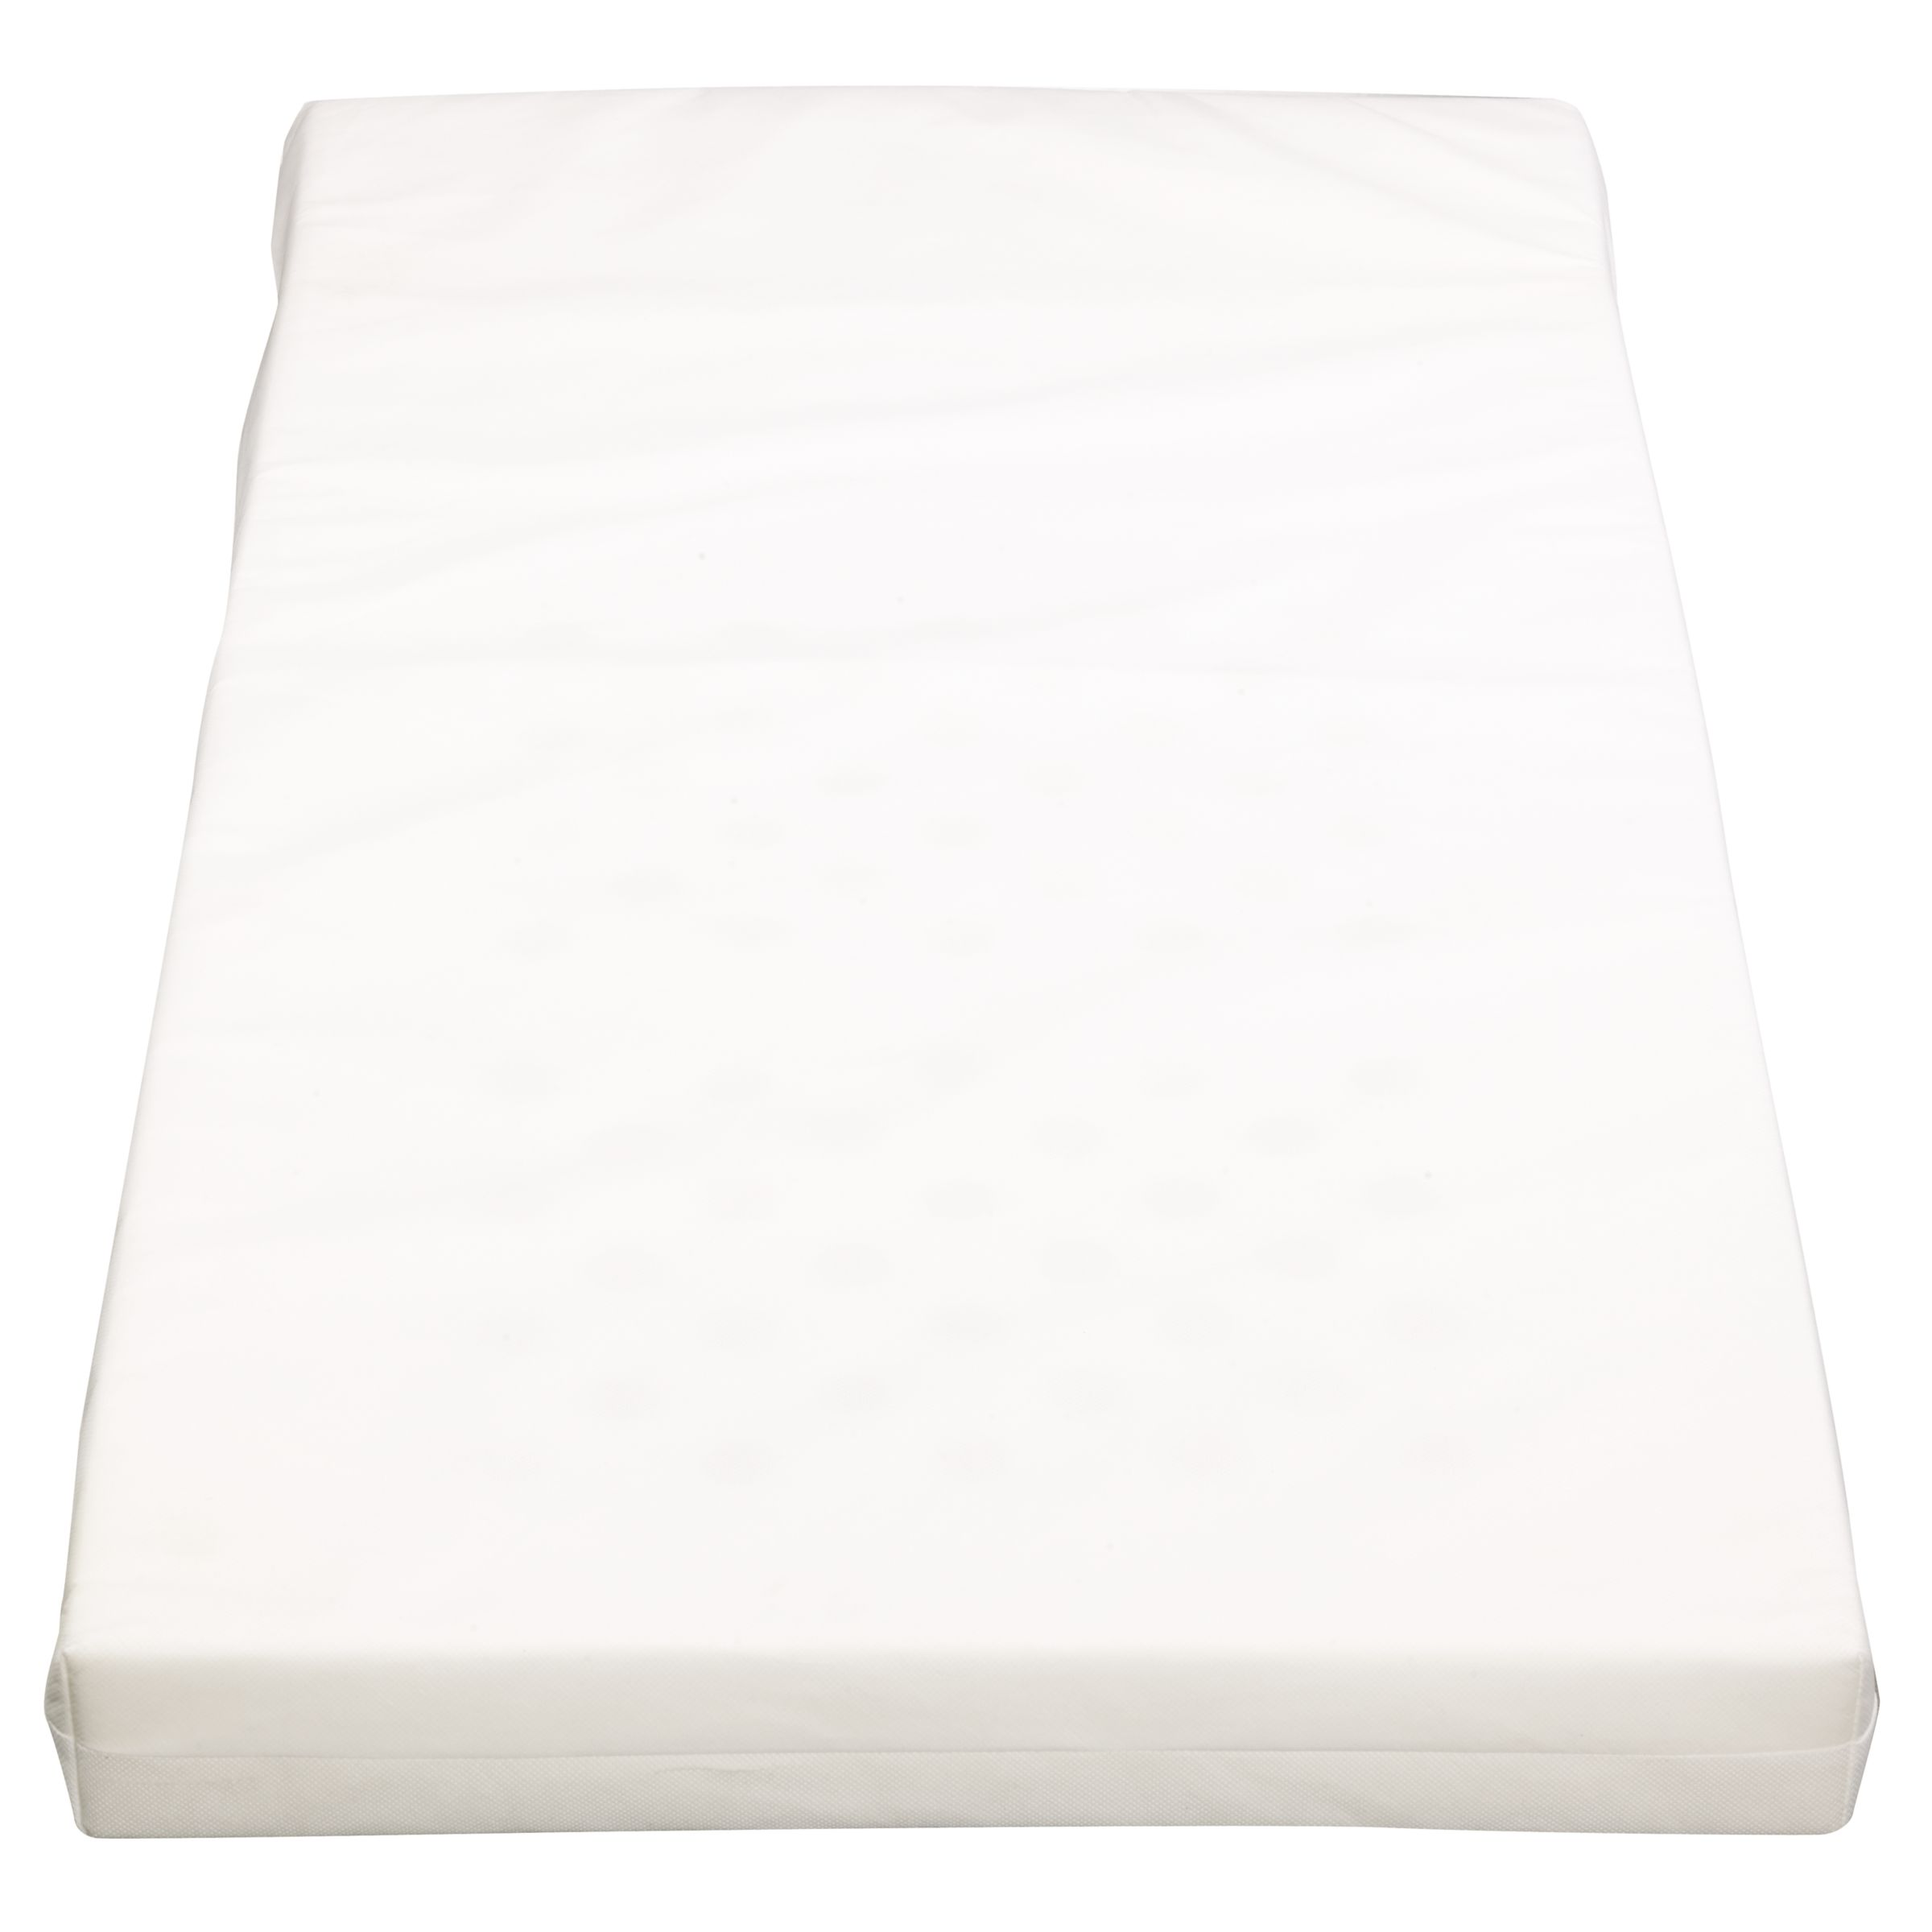 John Lewis Foam Cot Mattress, L120 x W60cm on PopScreen